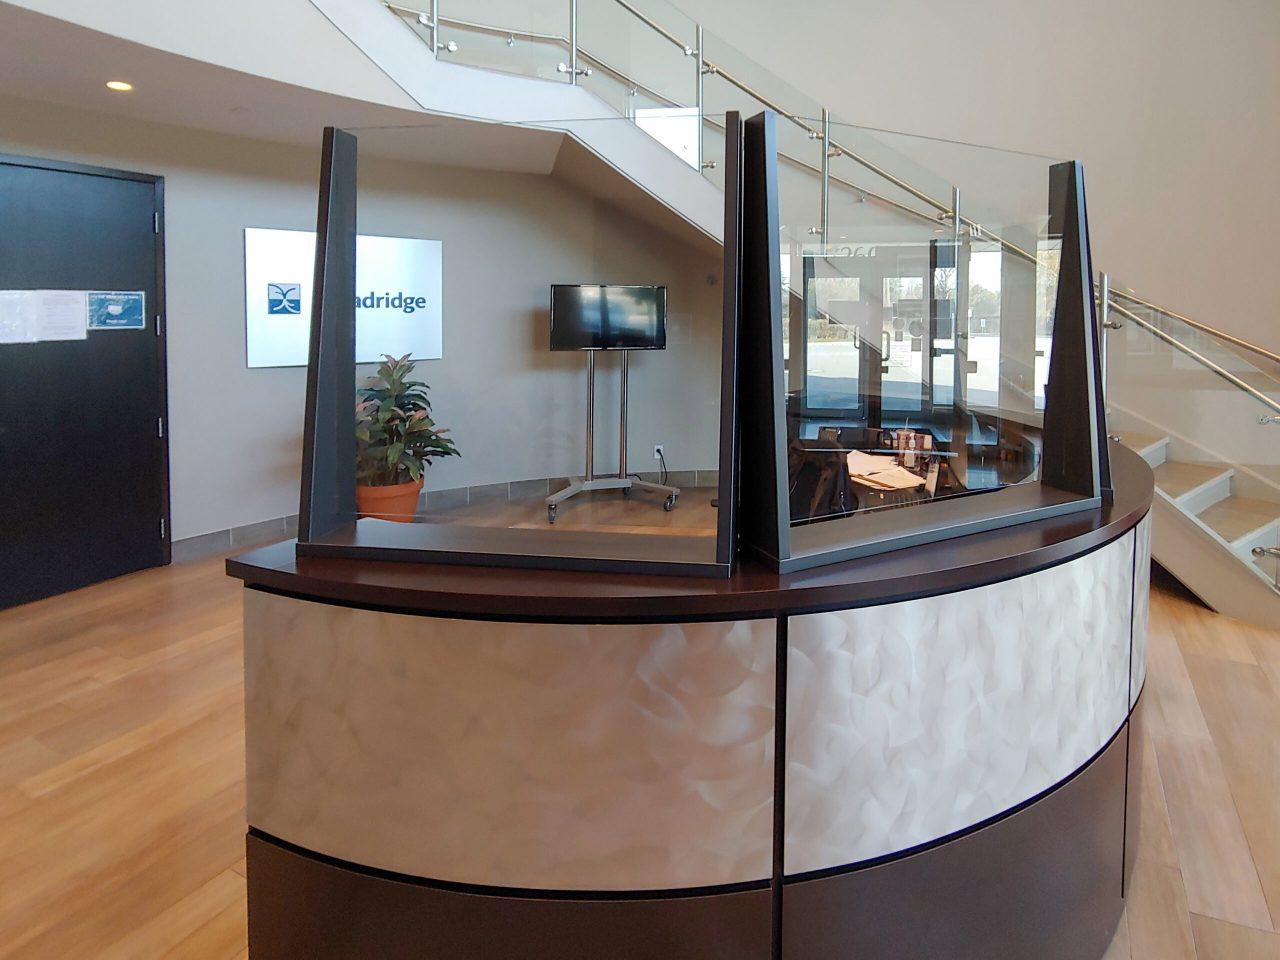 Transaction Shields on a Reception